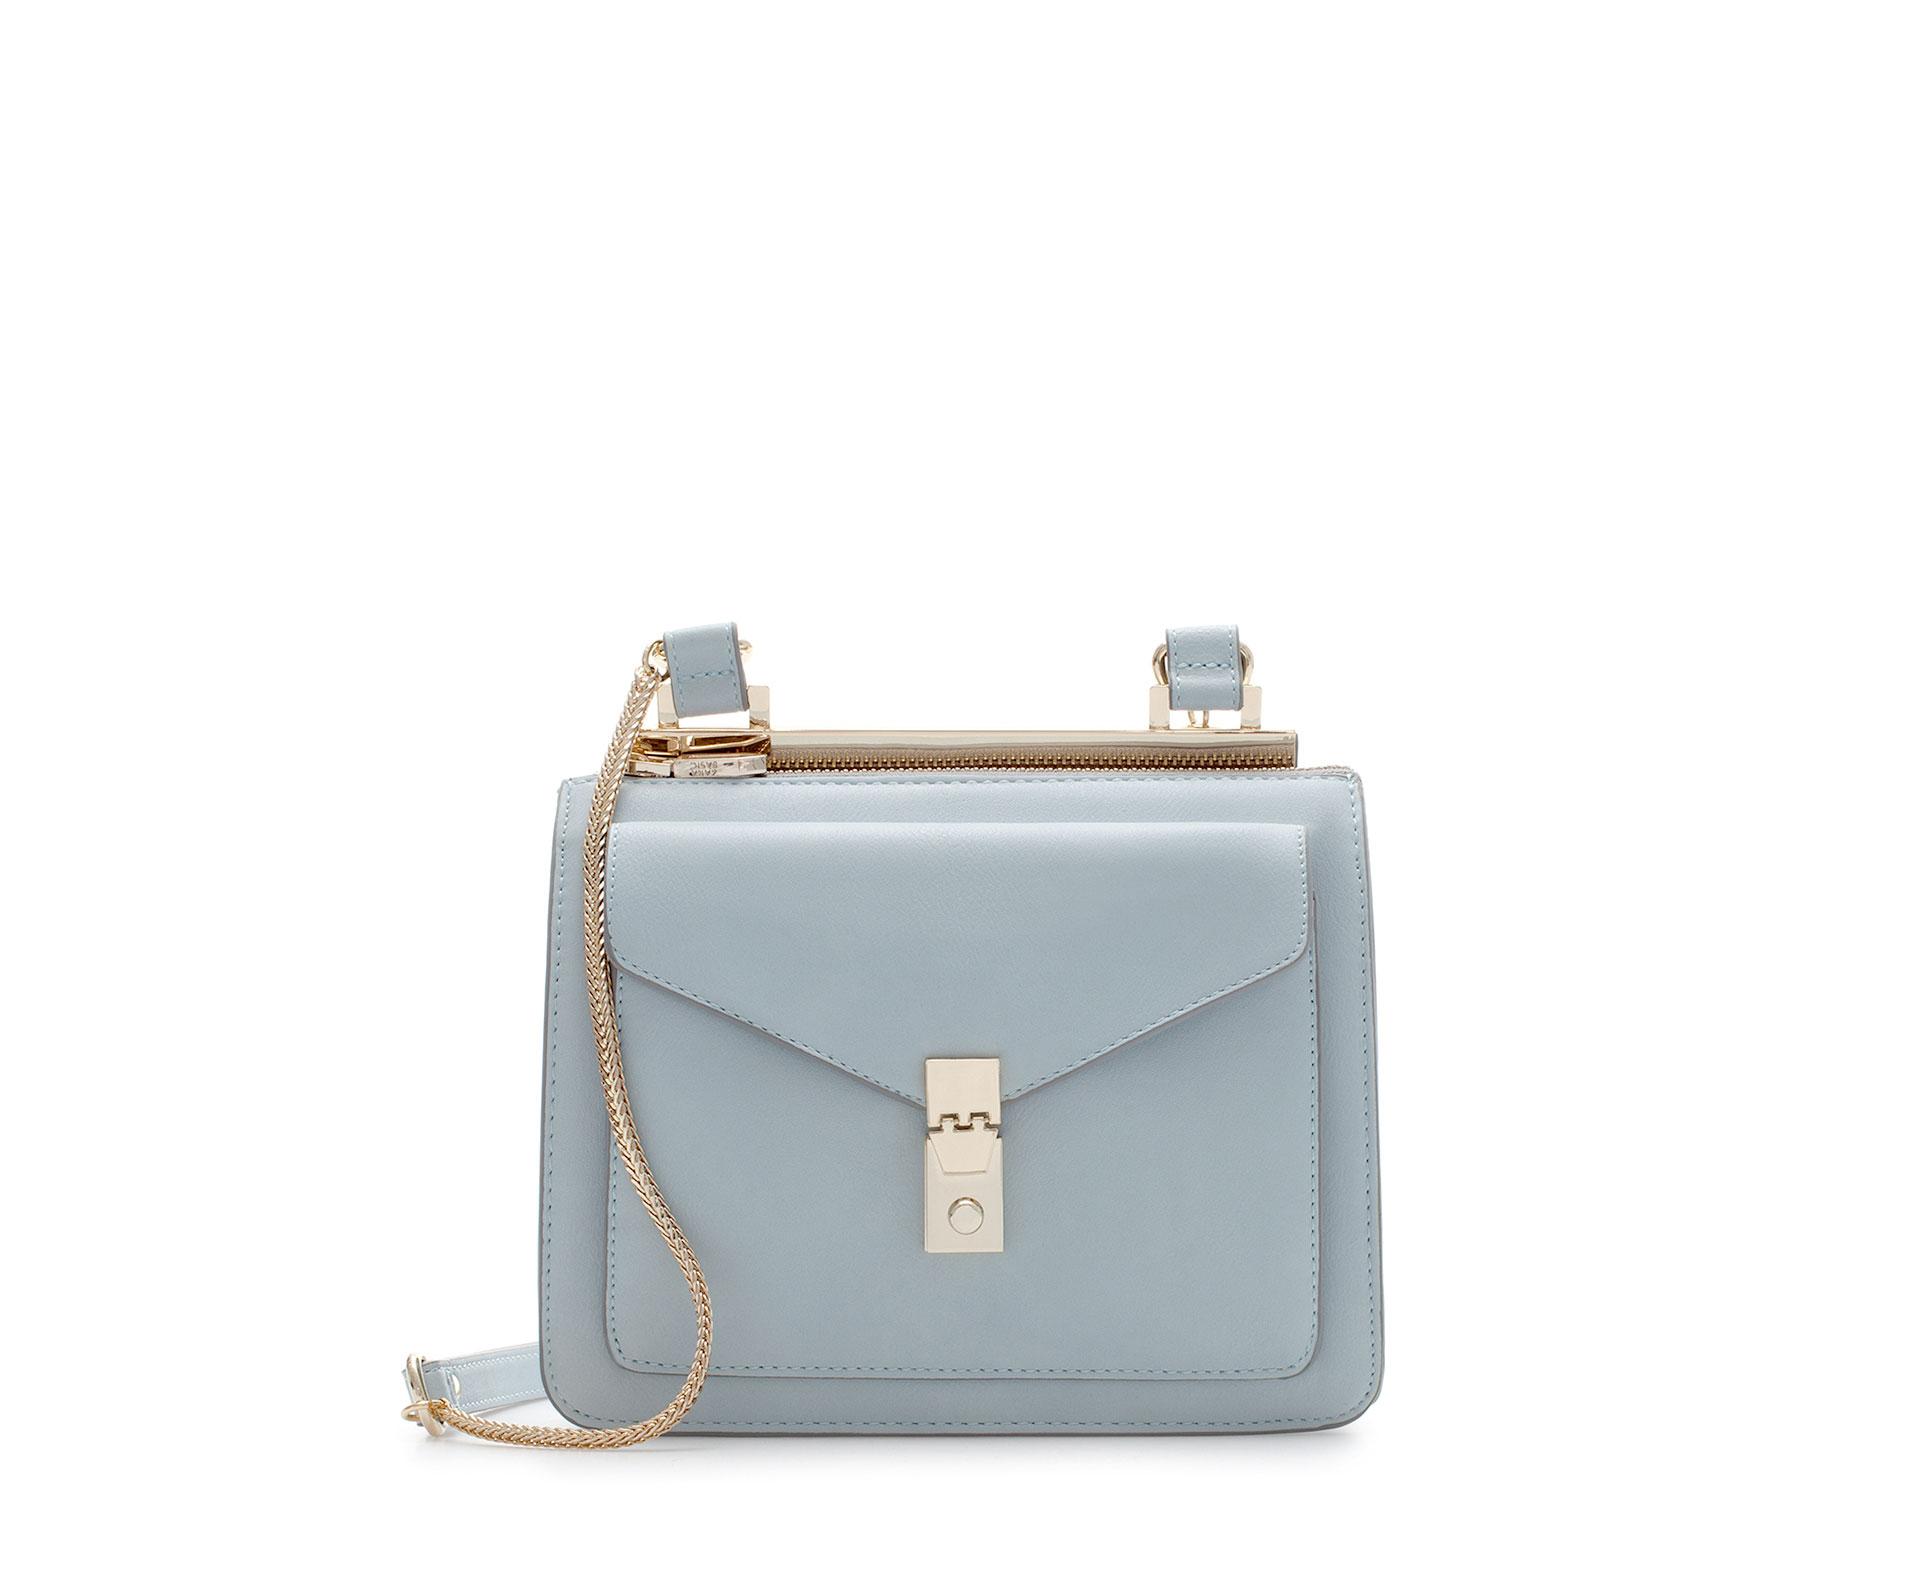 Zara Messenger Bag With Metallic Fastener In Blue Sky